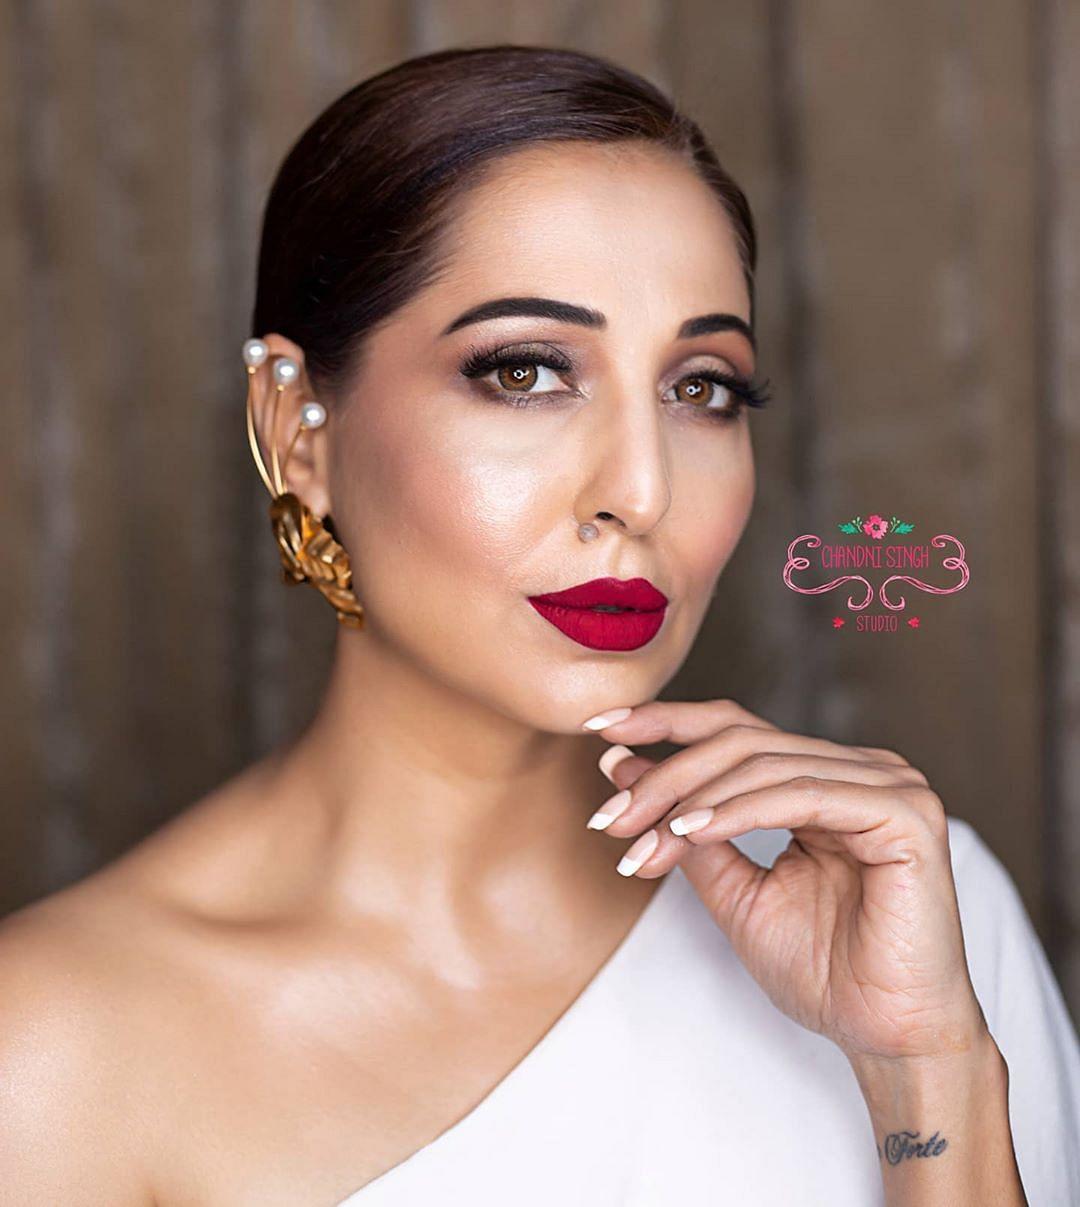 Chandni Singh